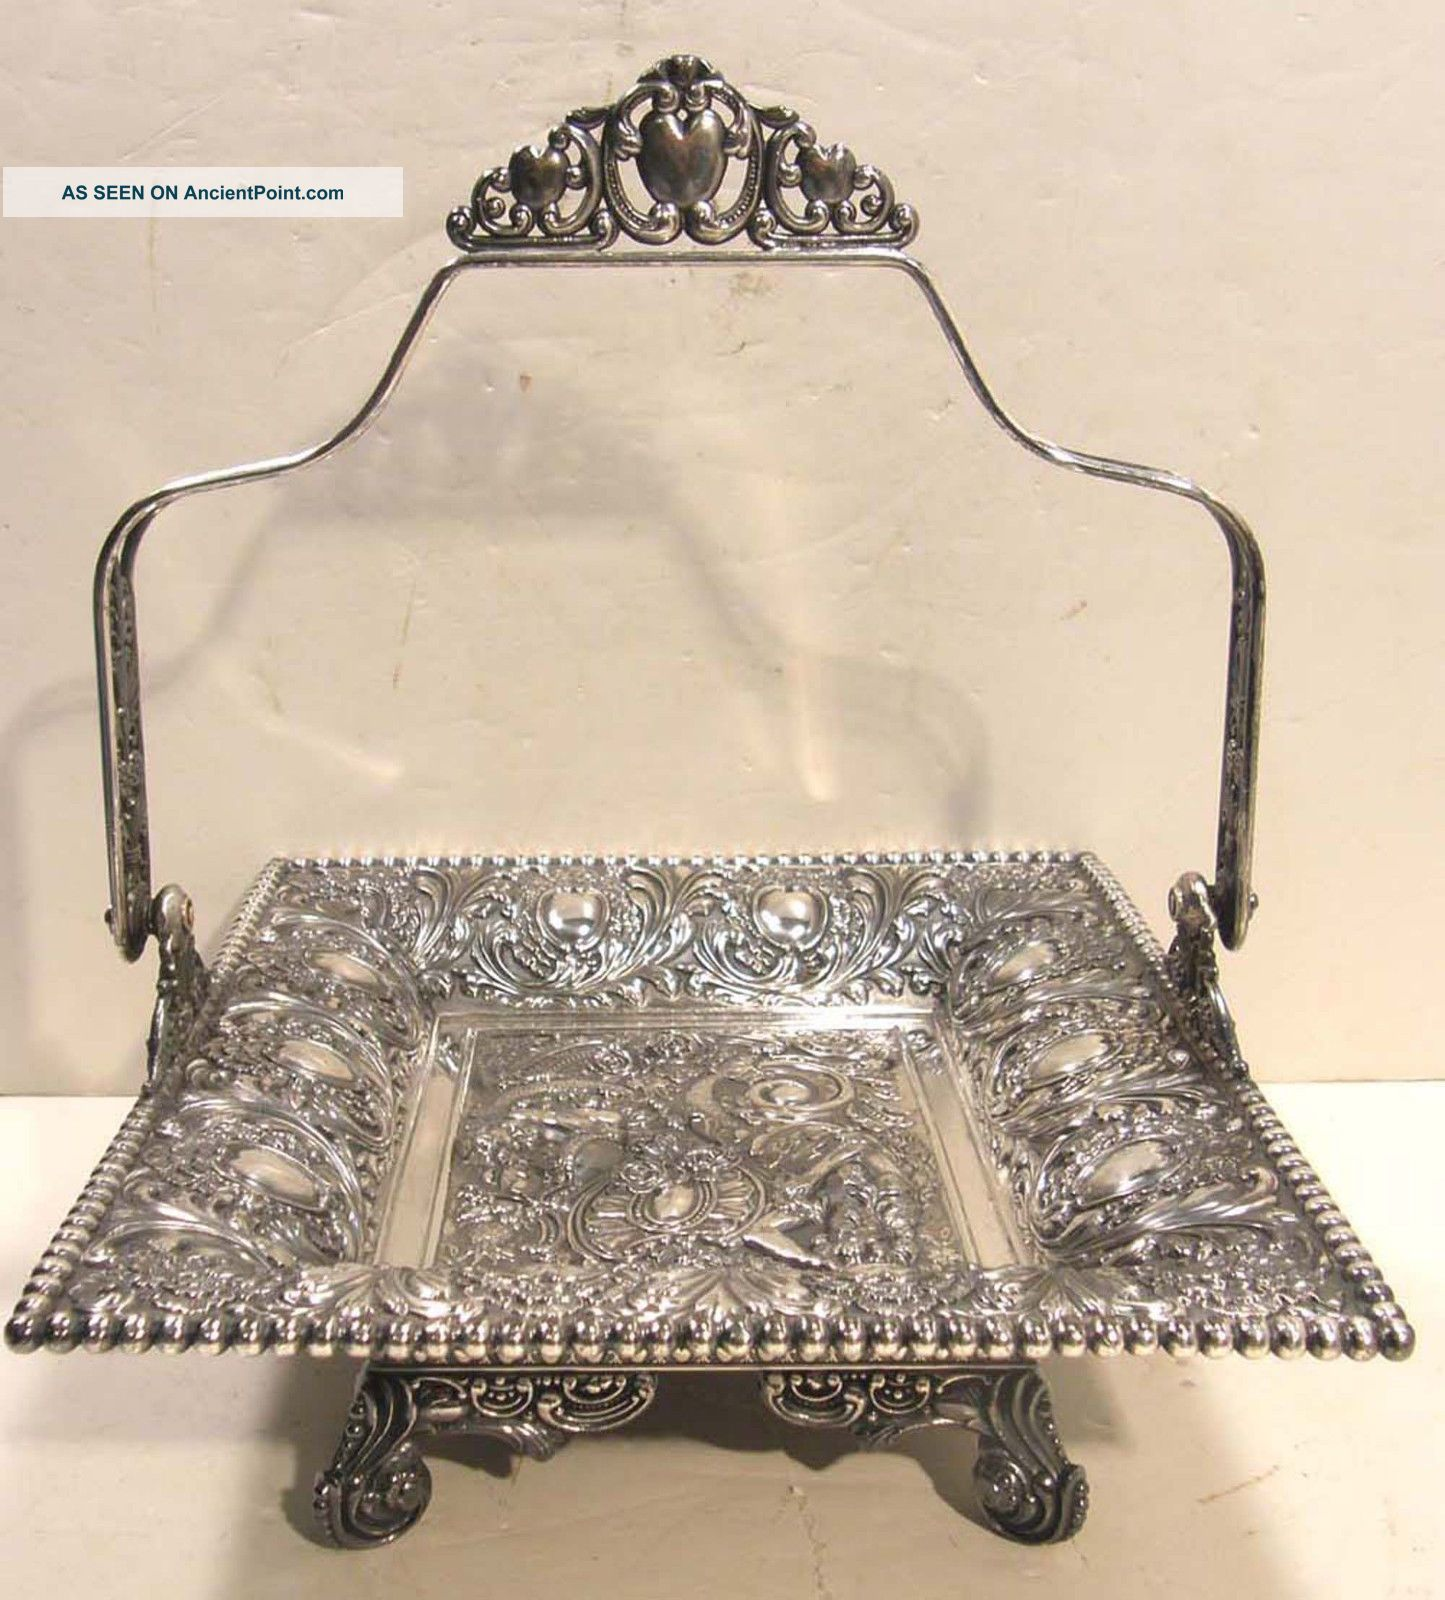 James Tufts Victorian Silverplate Footed Bride ' S Basket Ornate Mermaid Cherub Baskets photo